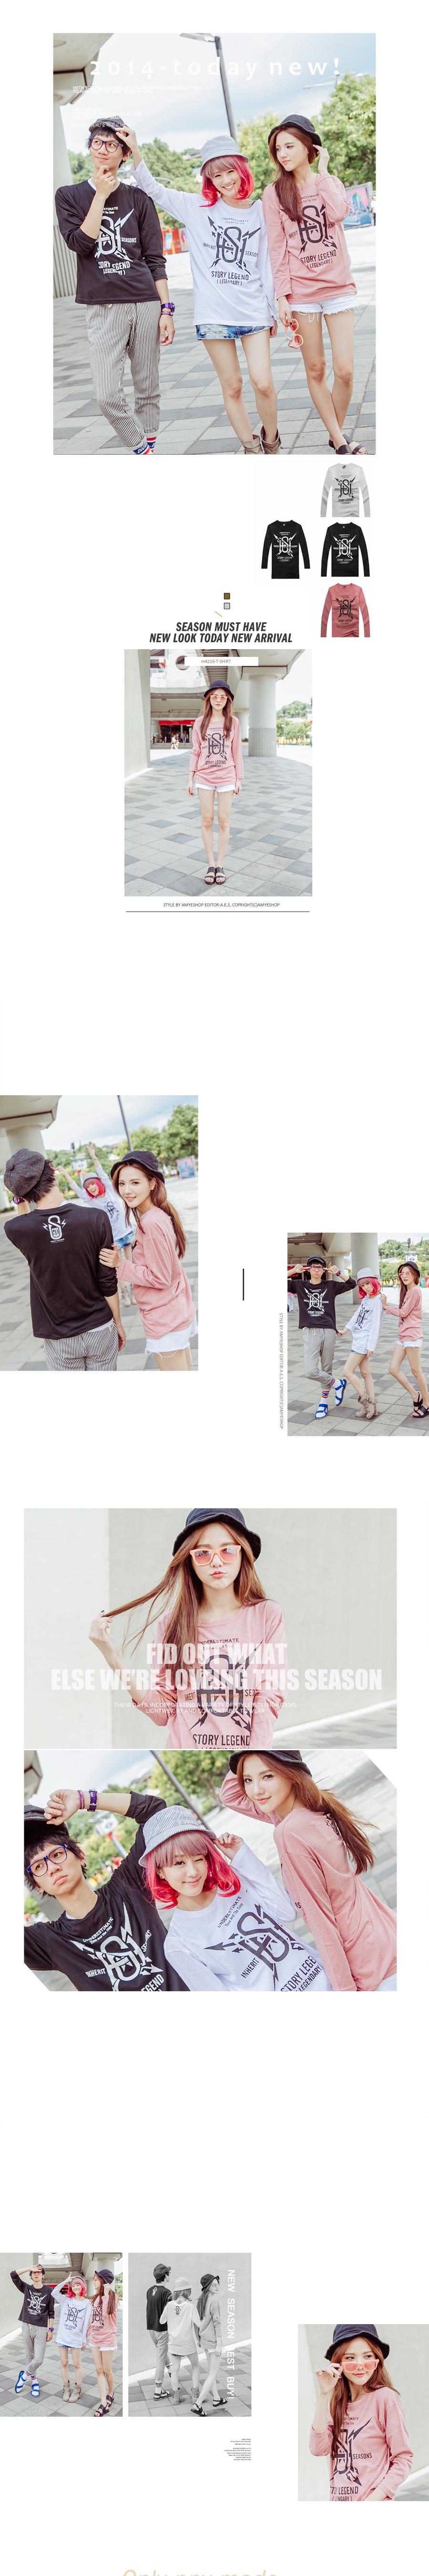 MIT台灣製  純棉   T-Shirt   T恤   長袖T恤   情侶T恤   SH 英文圖騰閃電矛設計長T 【M4216】艾咪E舖    情侶長袖